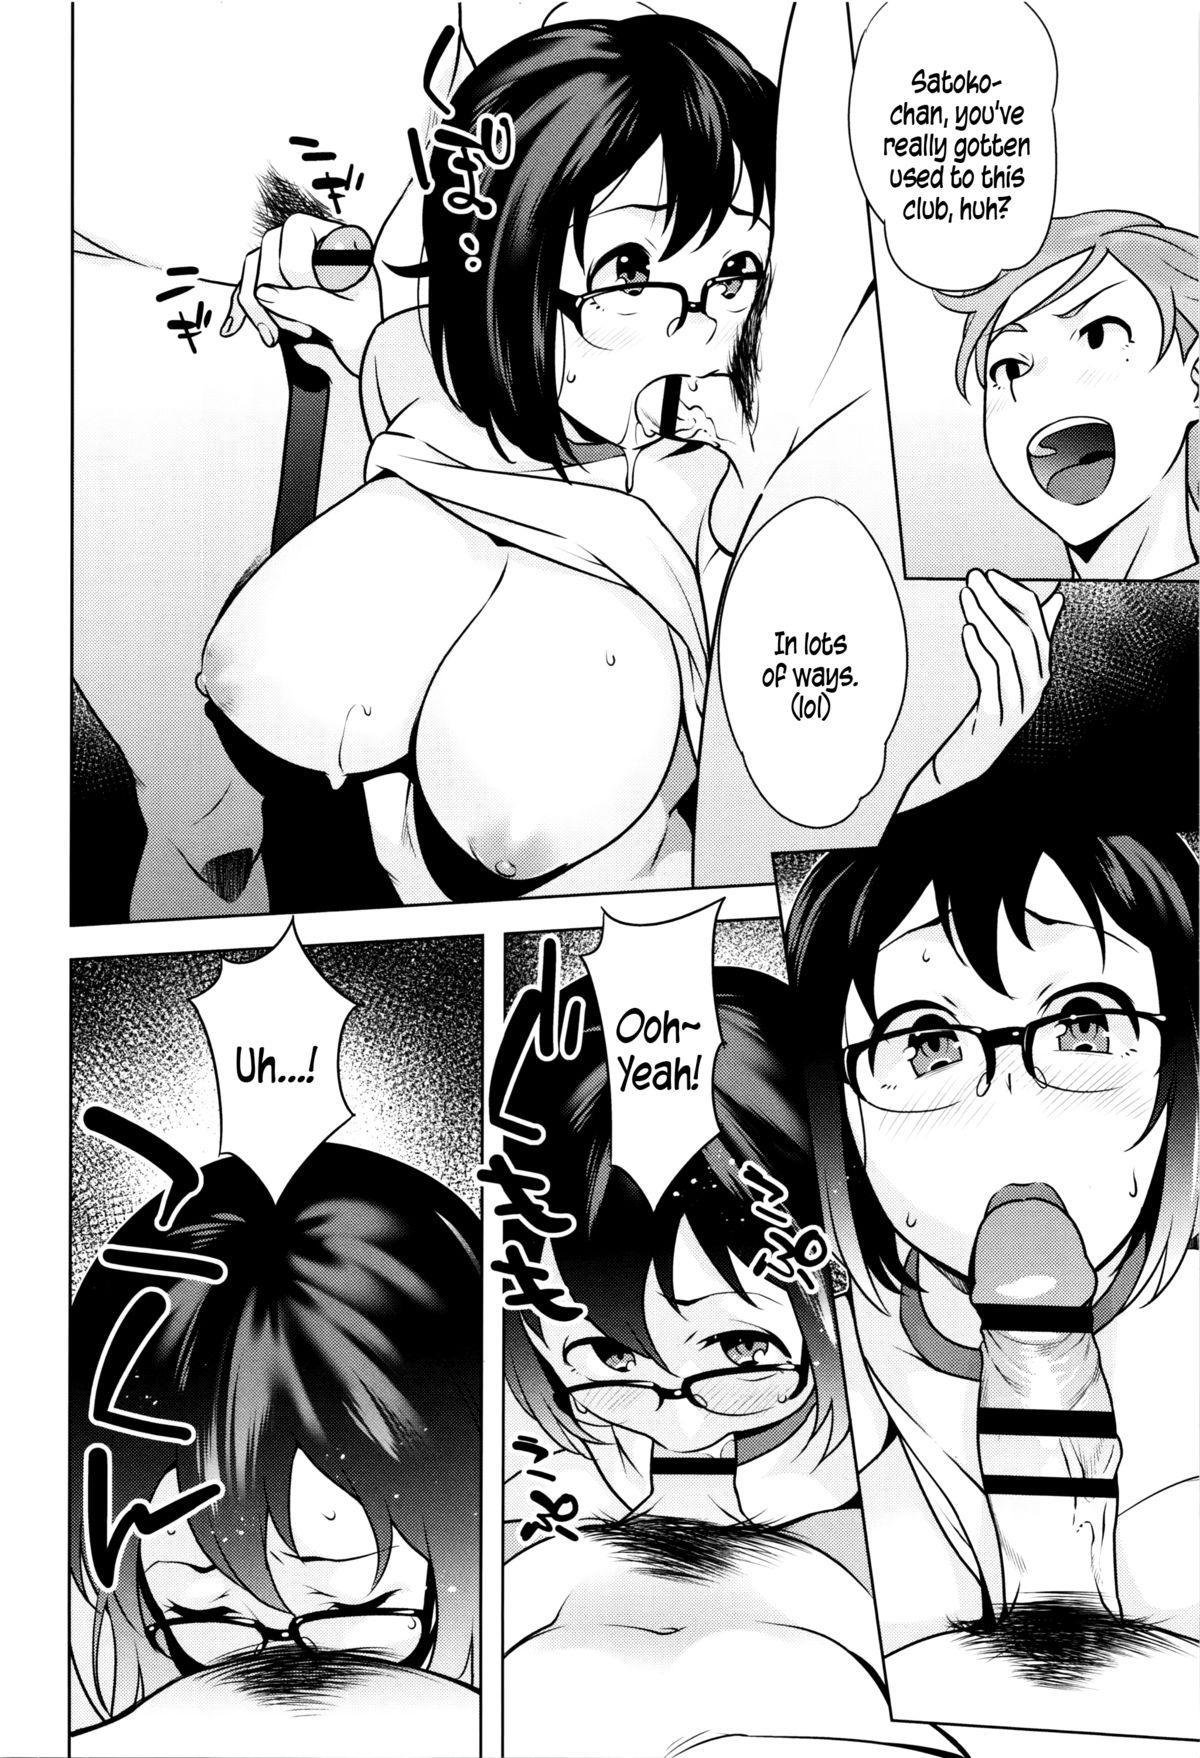 Hatsujou! Namaiki JK | Horny! Cheeky JK 128